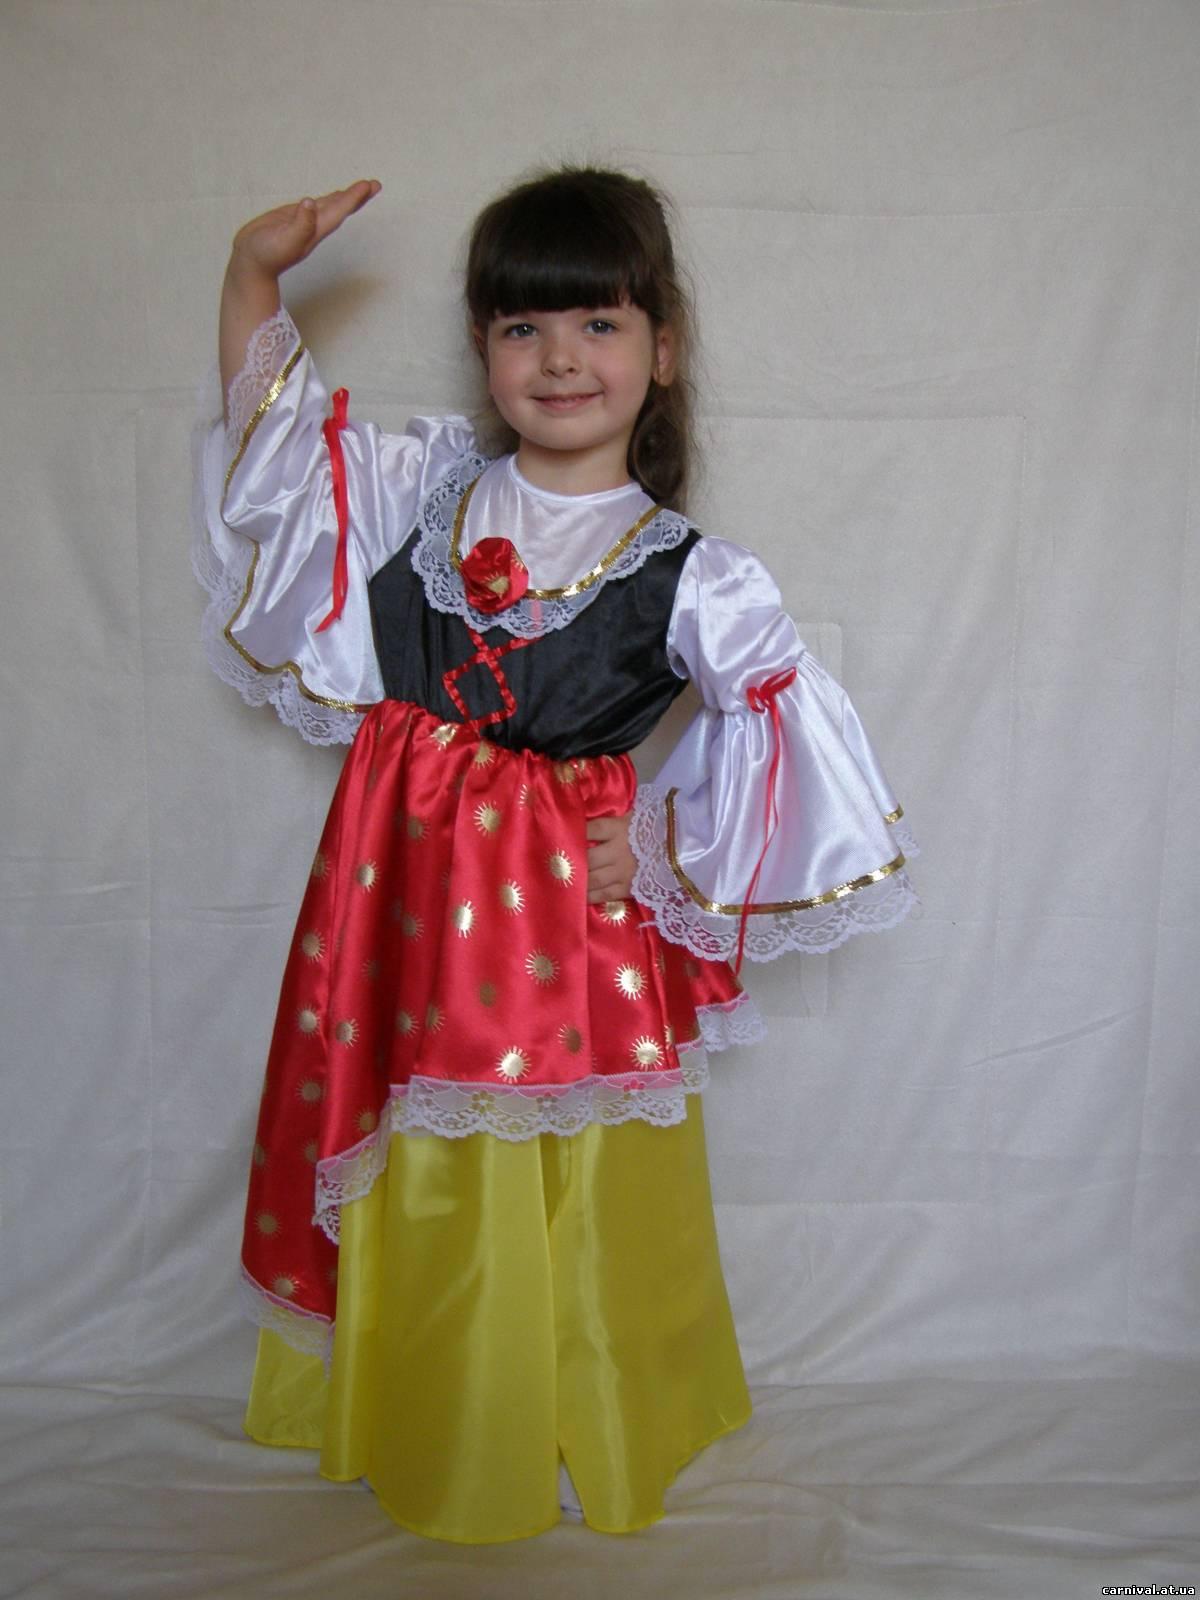 Фото азиатских детей до года